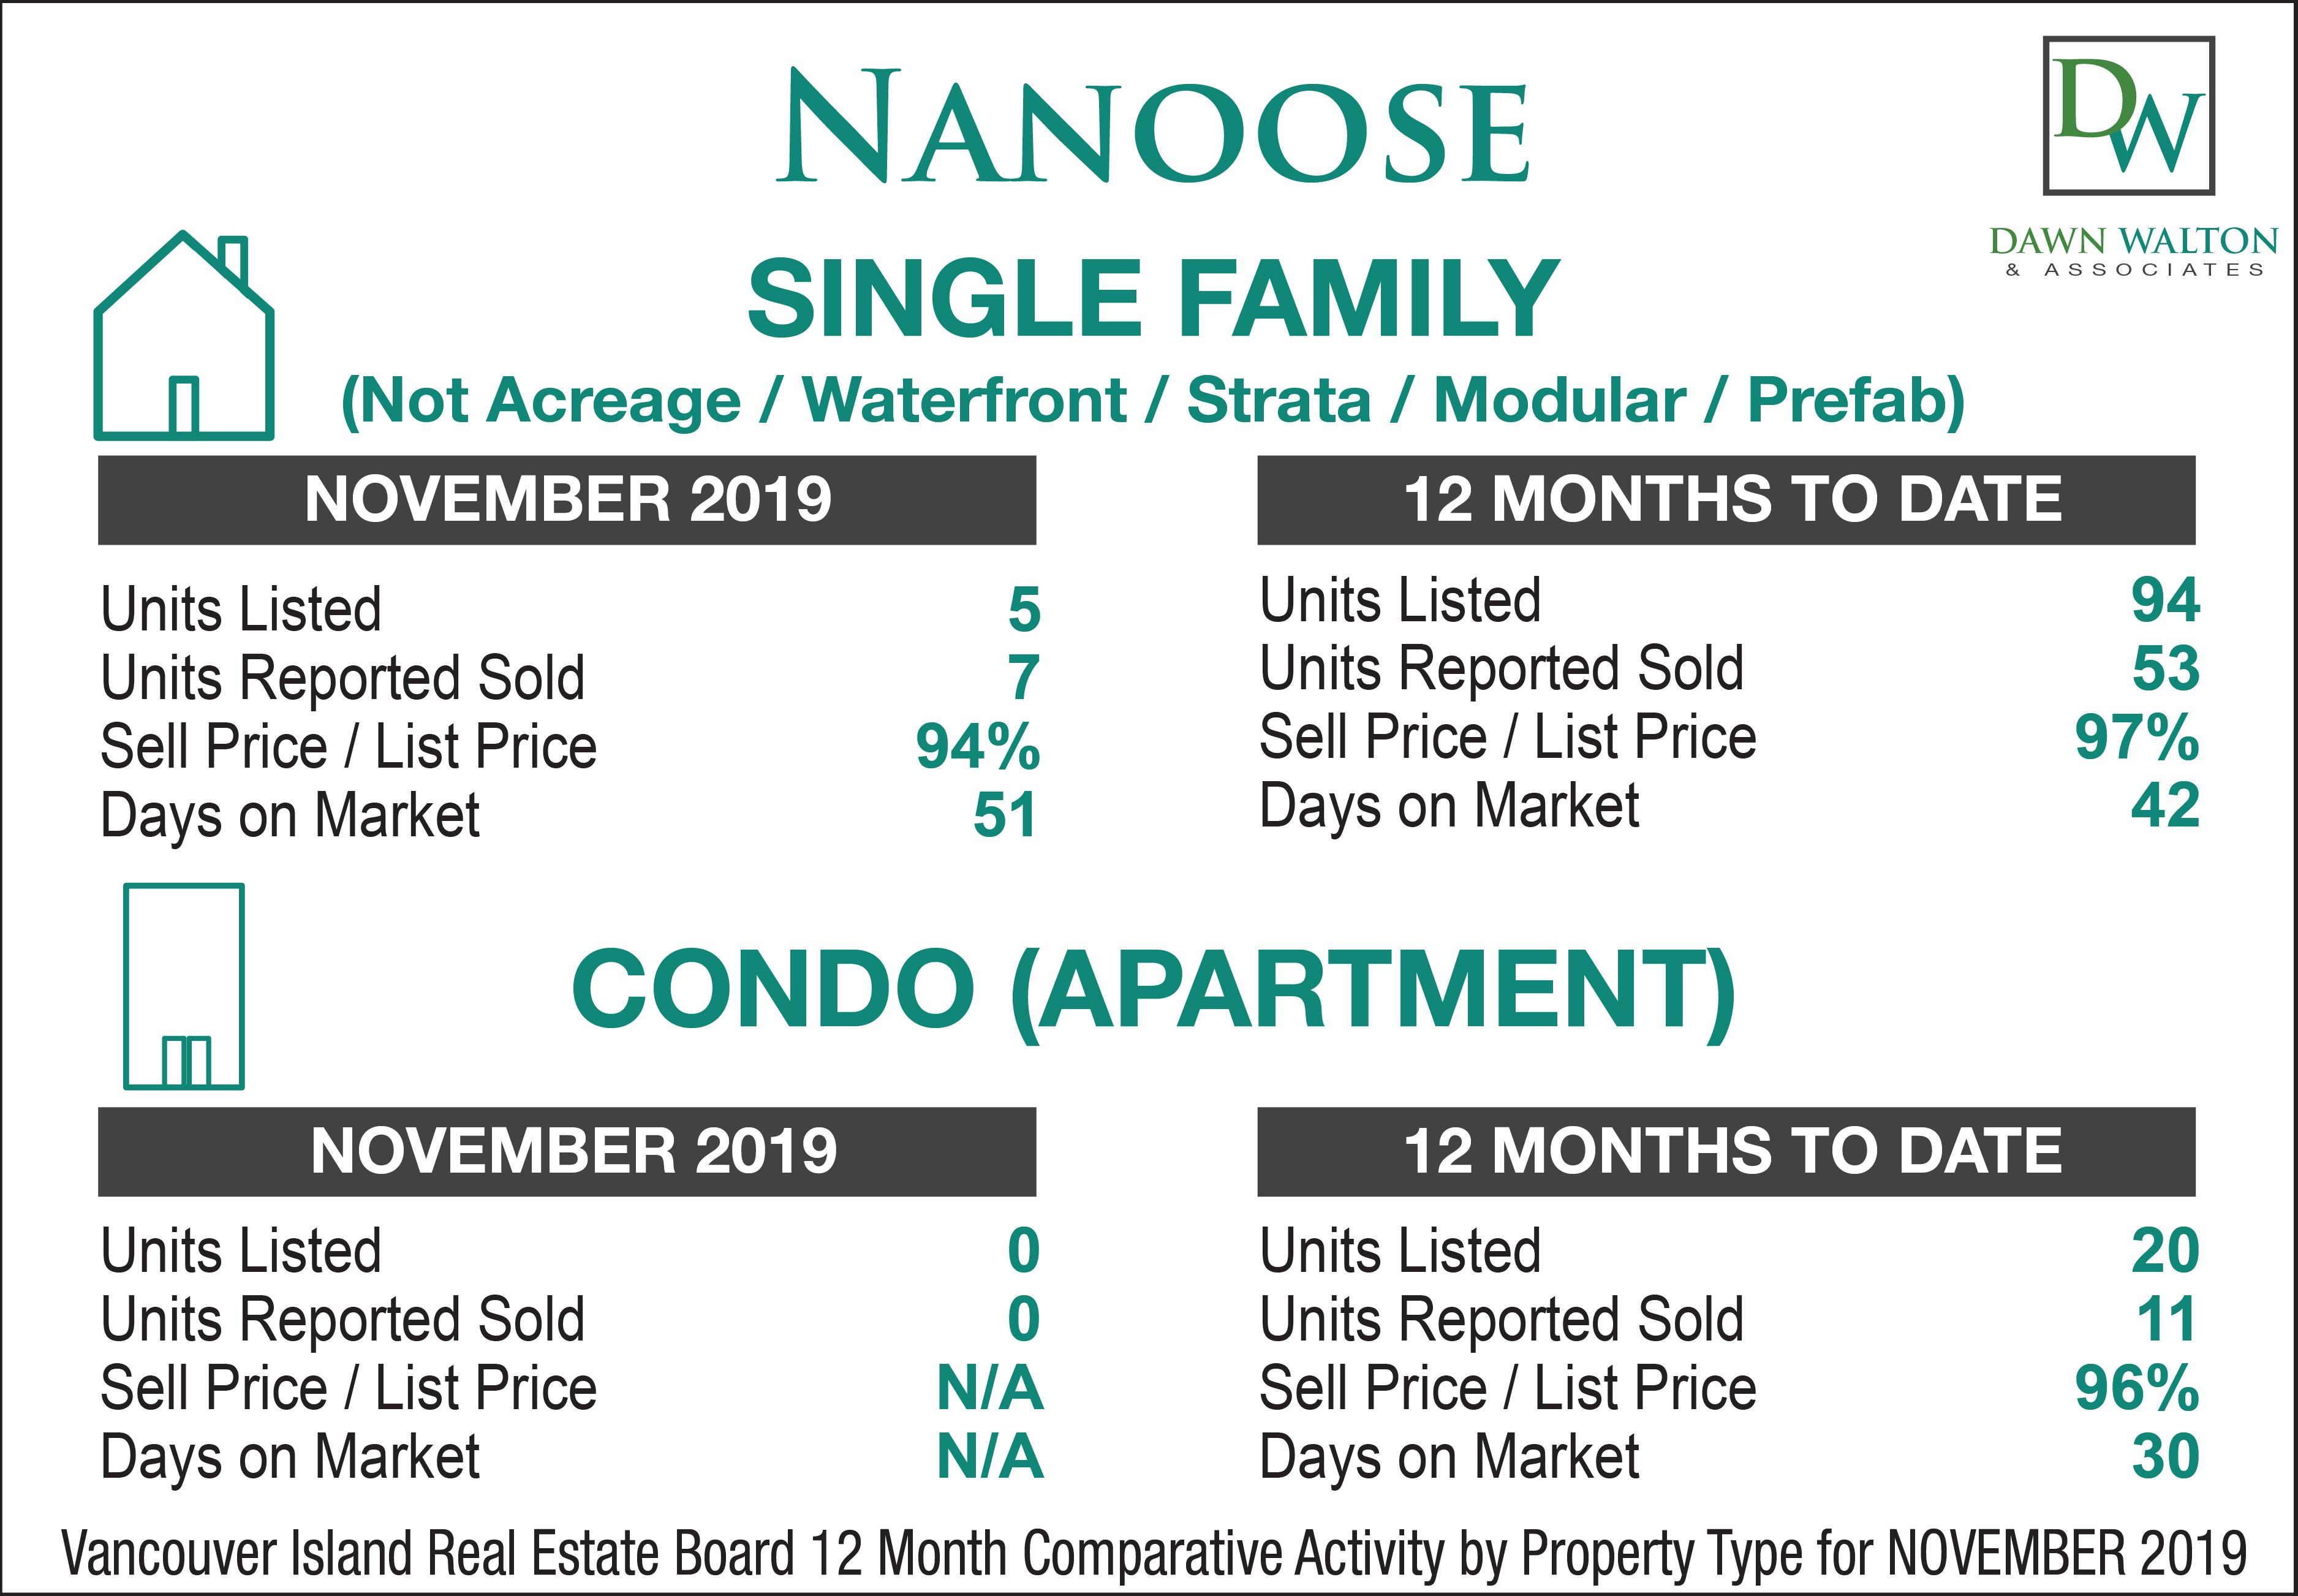 Nanoose Real Estate Market Stats November  2019 - Nanaimo Realtor Dawn Walton